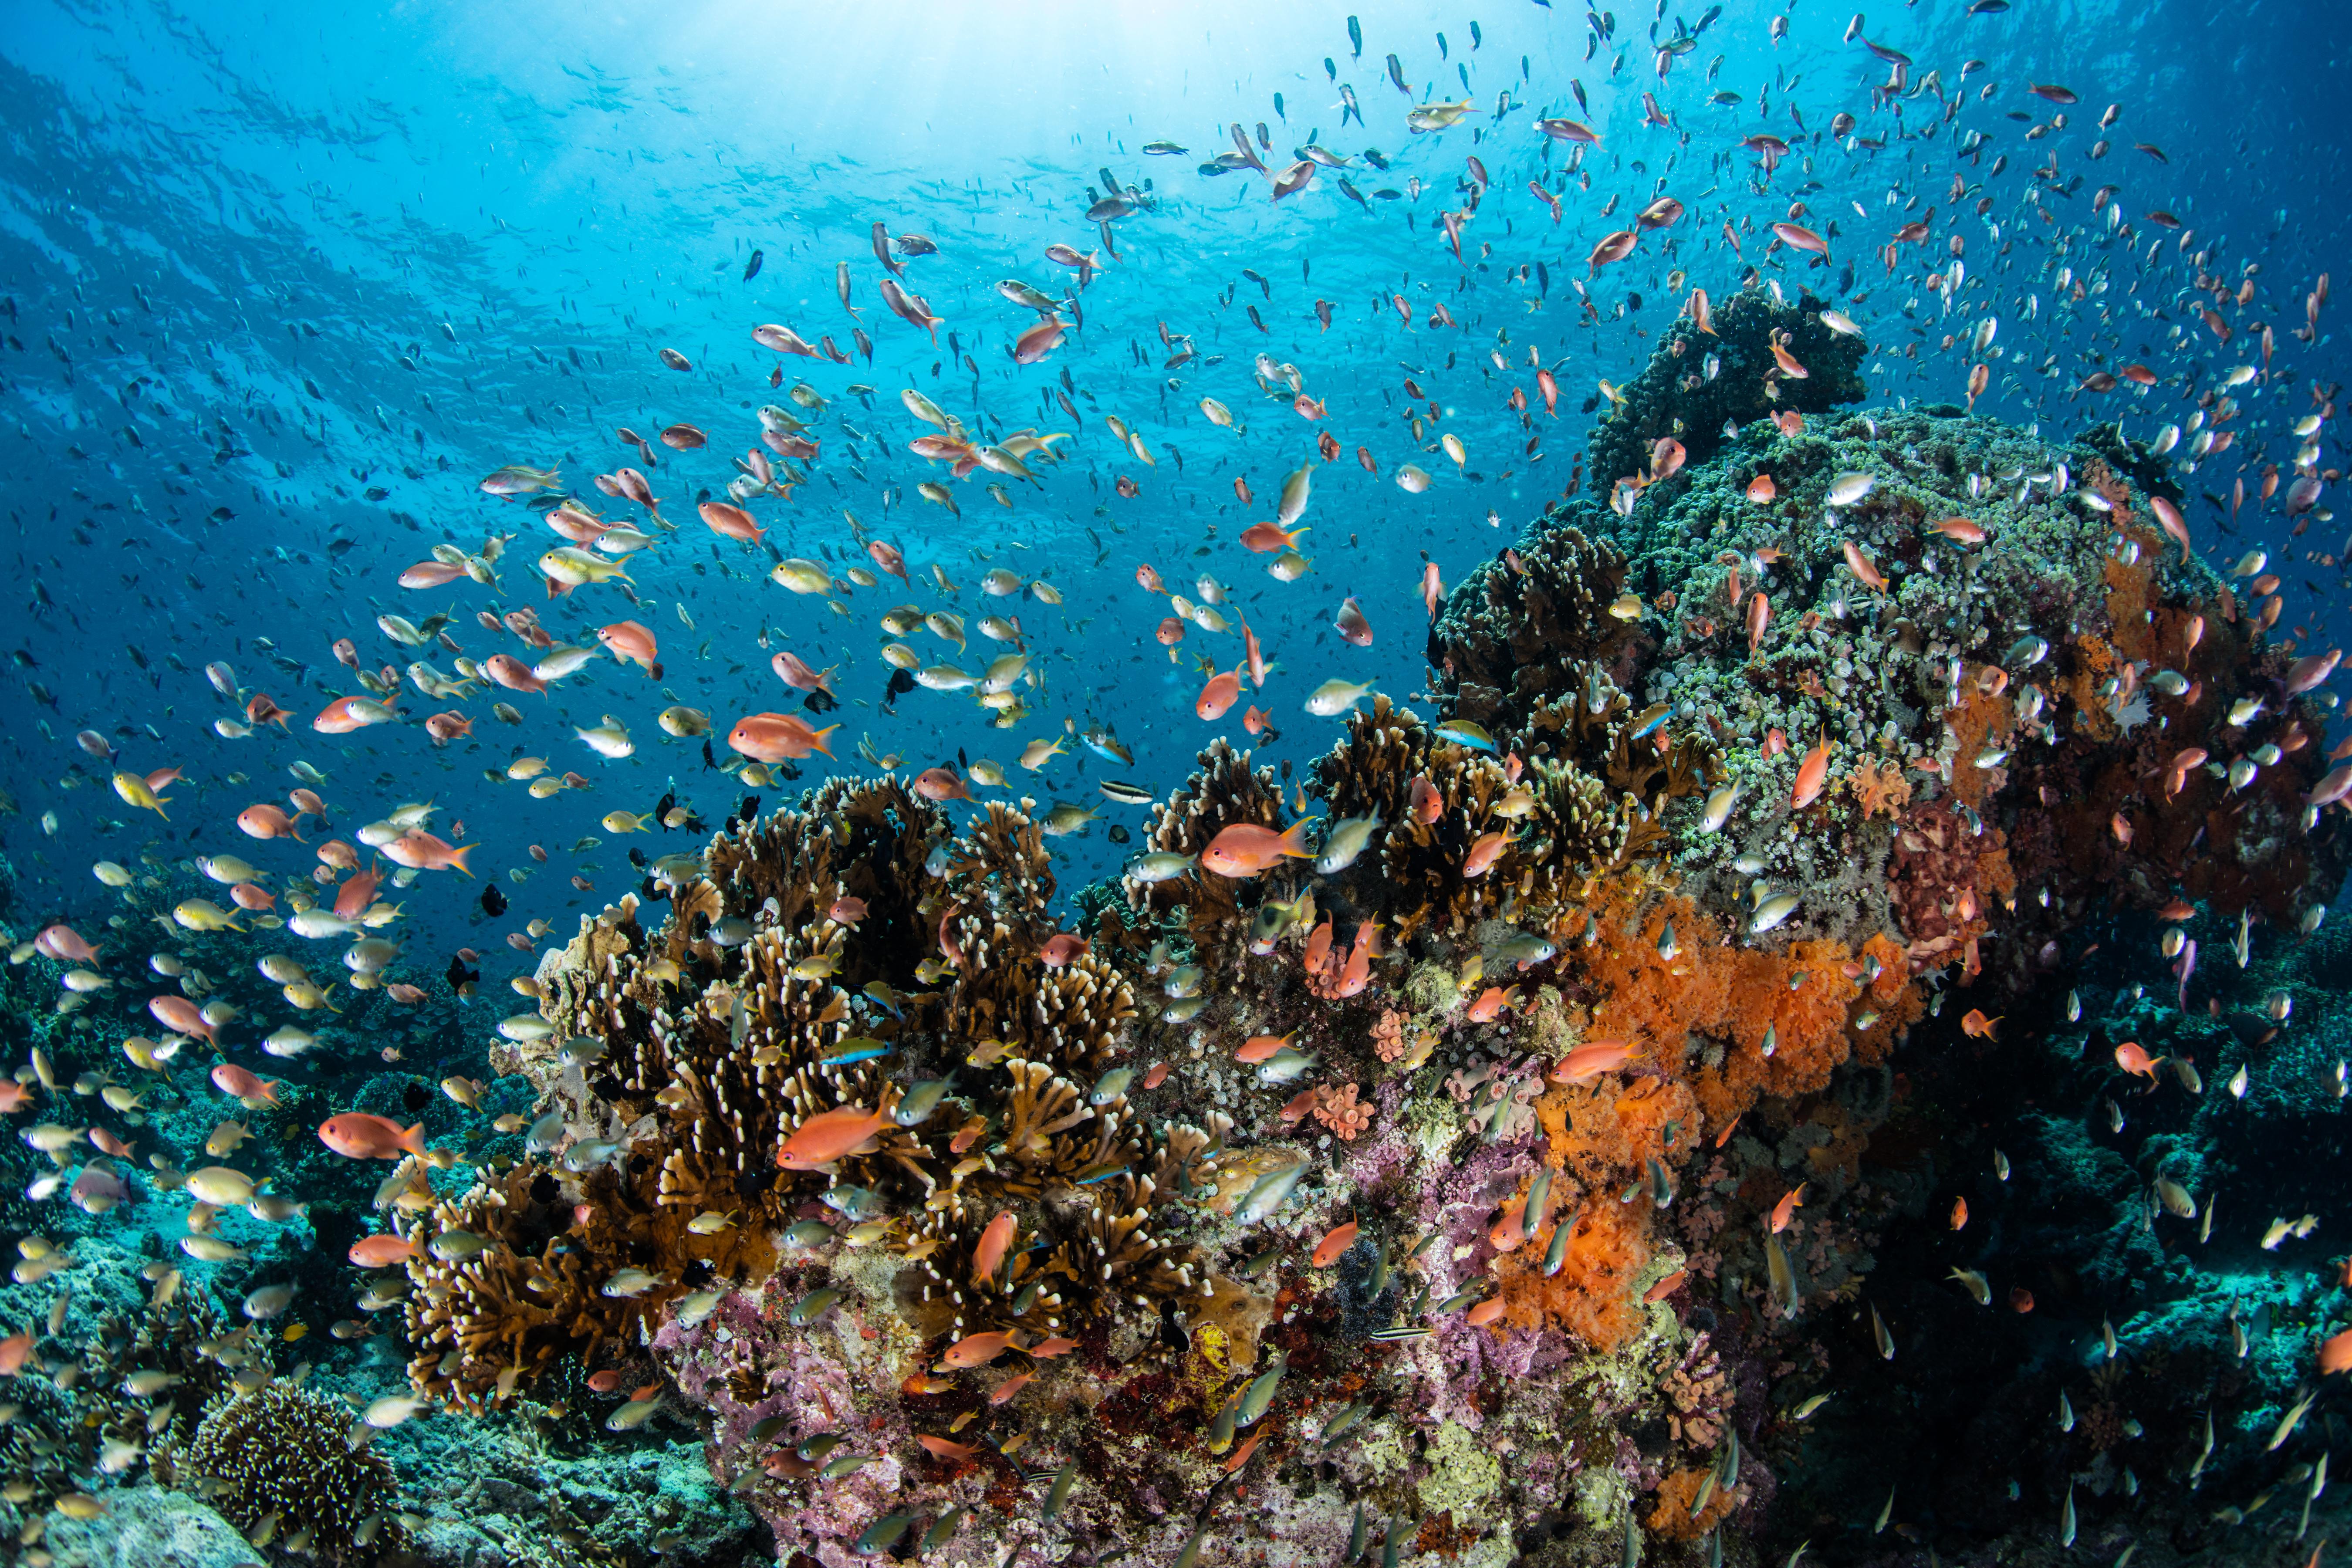 Characteristics of the Ecosystem